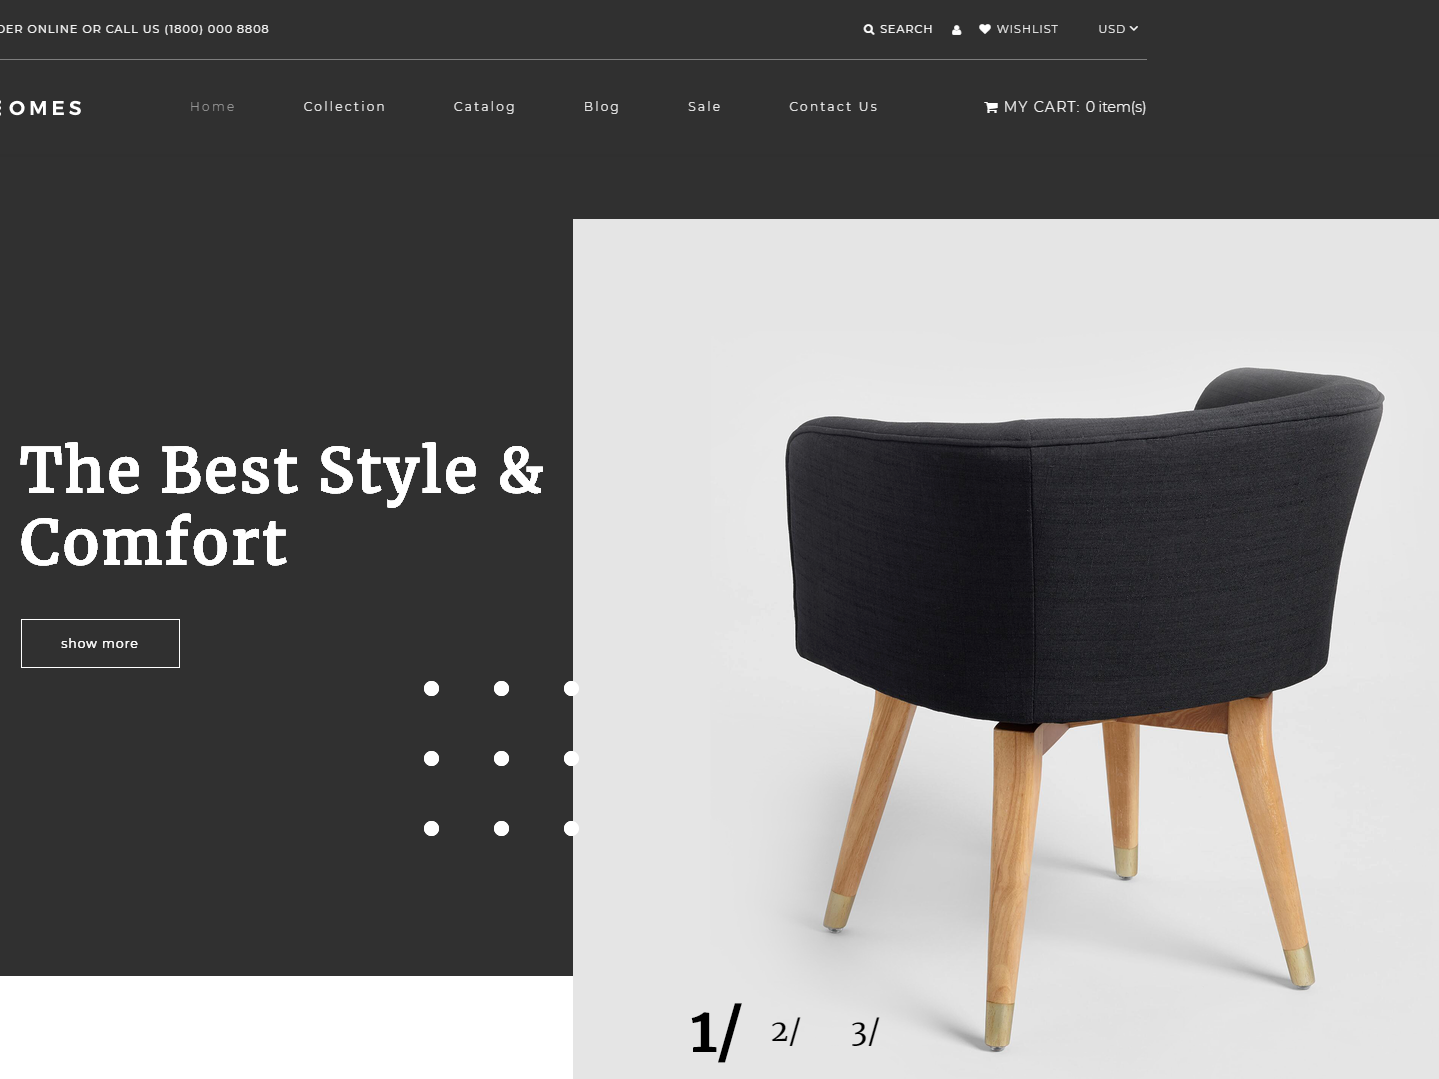 Homes - Home Decor Multipage Minimalistic Shopify Theme website webdesign shopify shopify theme minimalistic multipage home decor